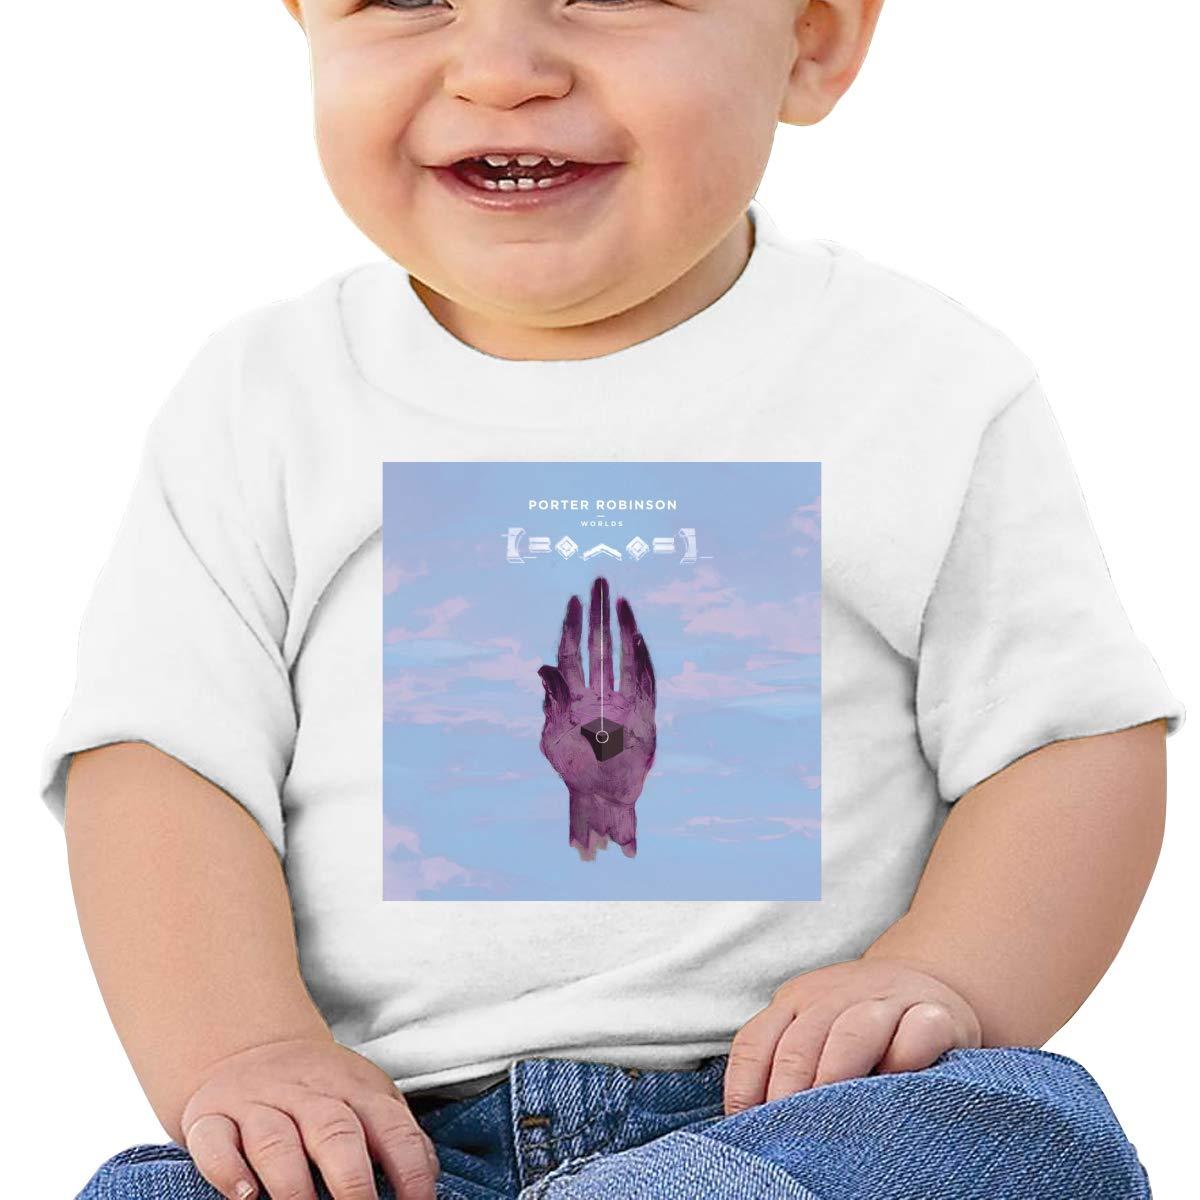 Kangtians Teenagers Boys Porter Robinson Shirts Tee Childrens Shirt